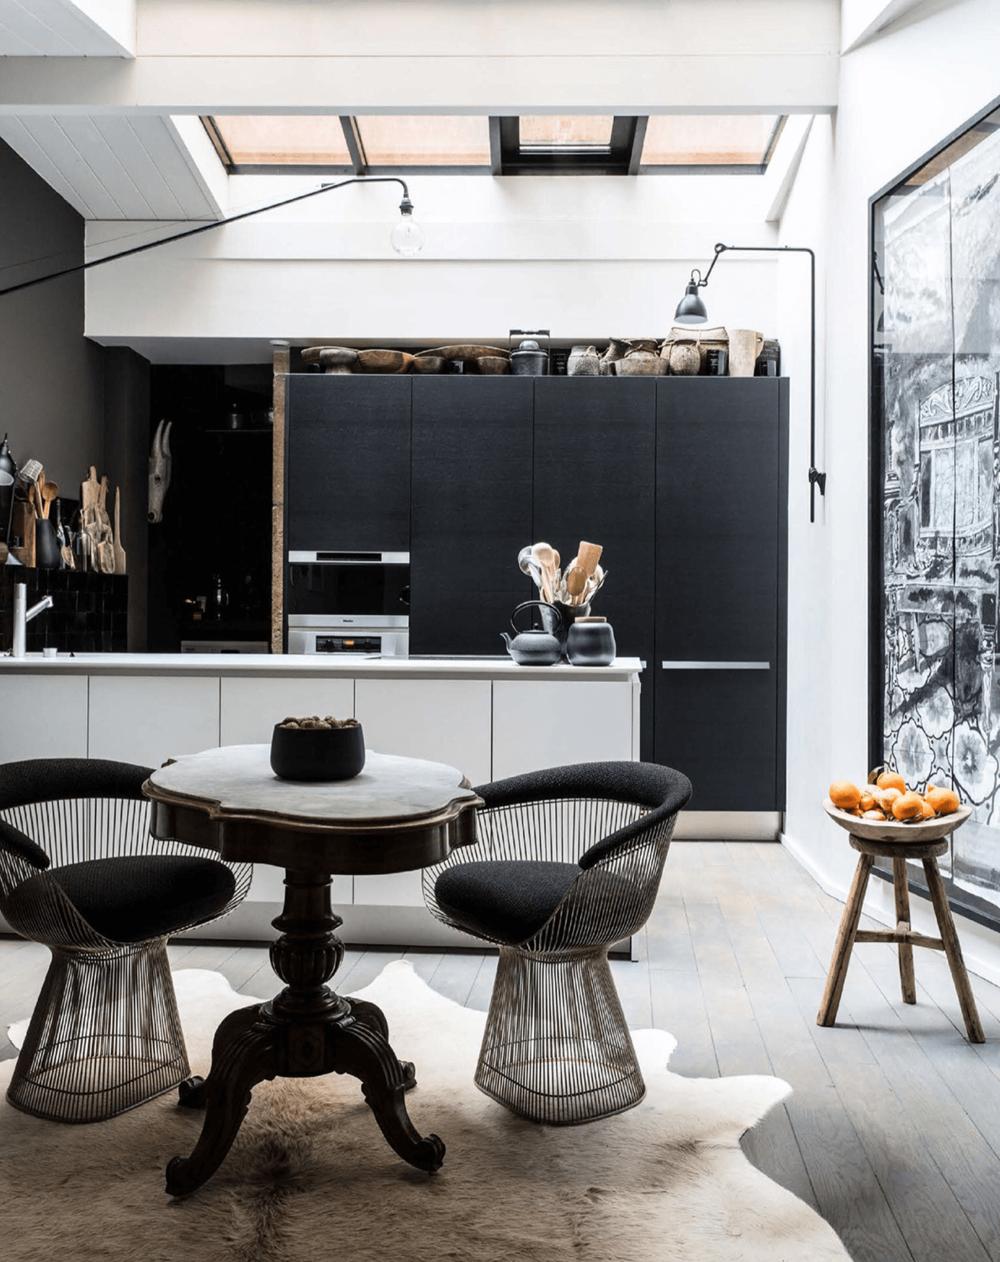 Kitchen Black White Rustic Elle Decor UK